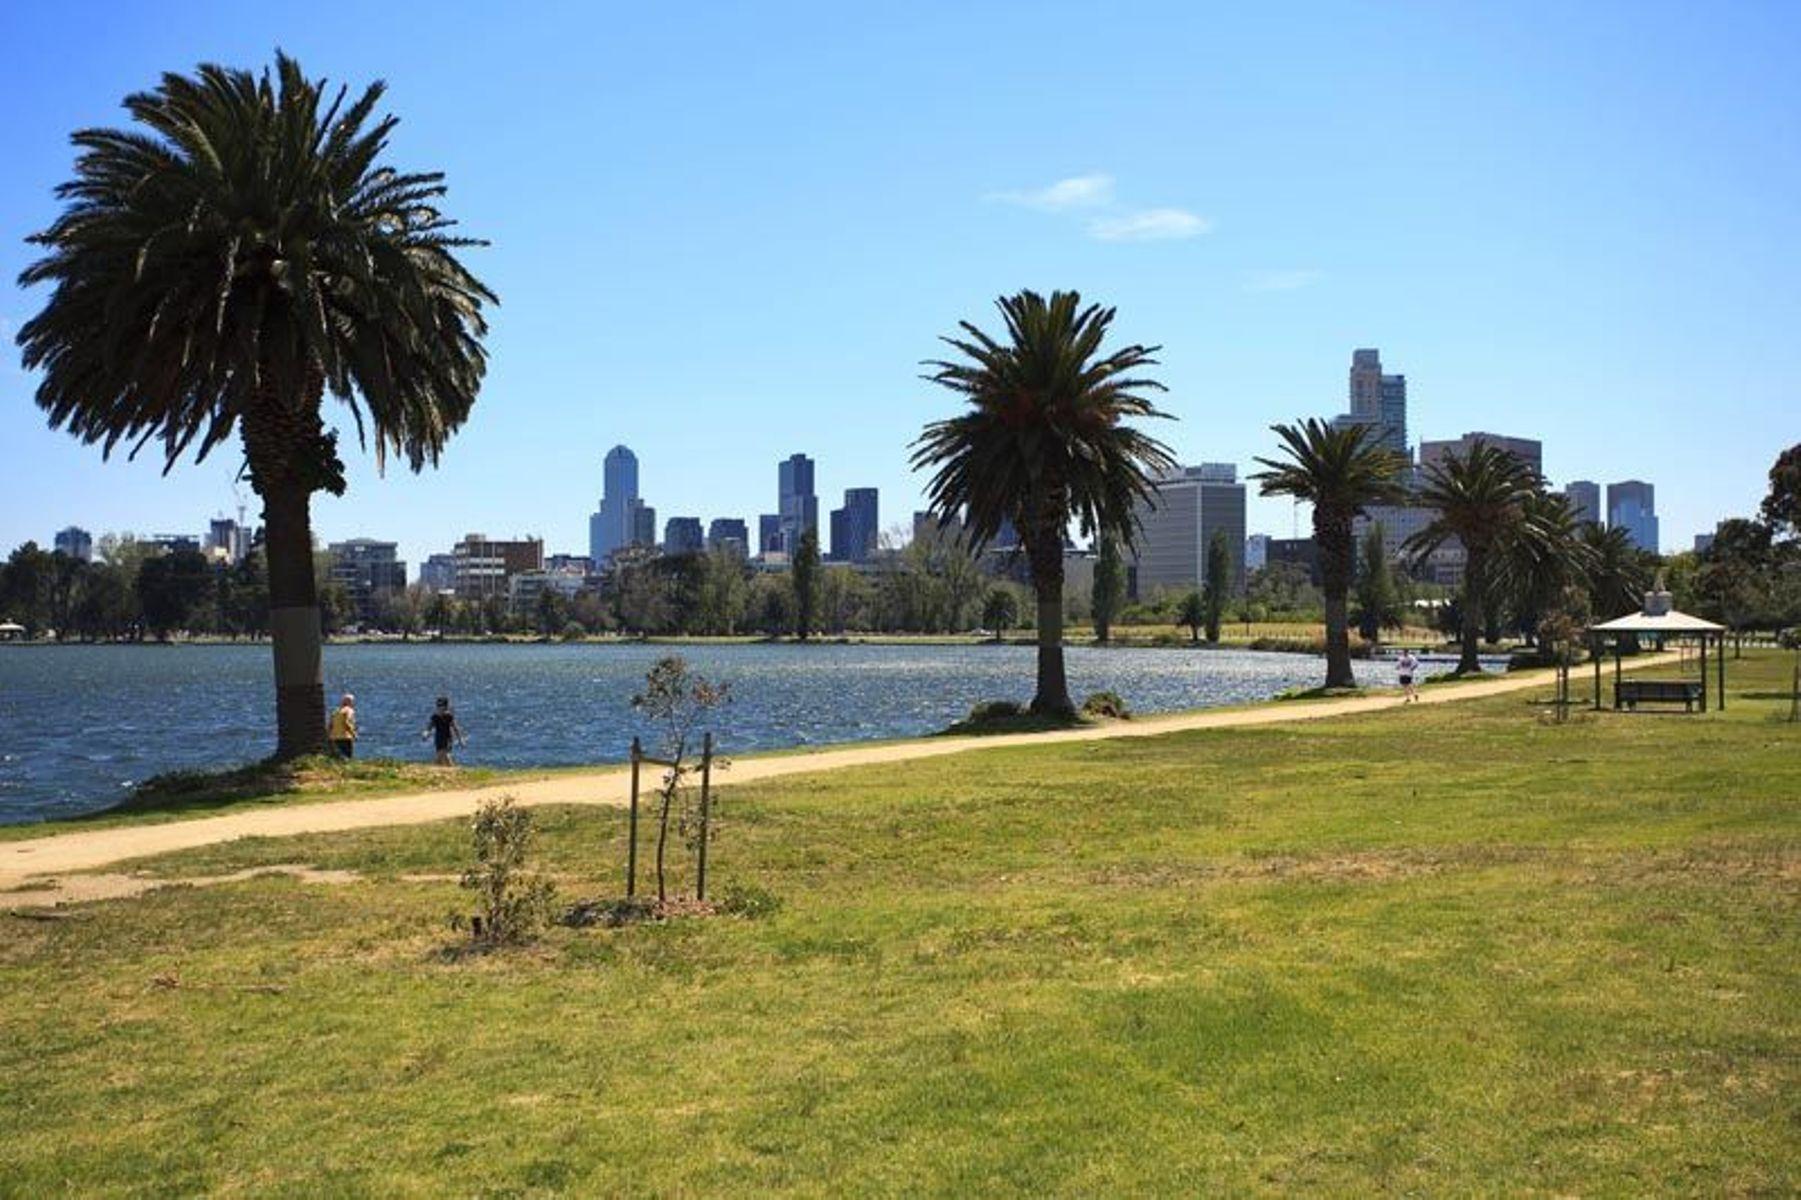 991 VCL3556 Queens Road Melbourne Melbourne City Melbourne Victoria Australia